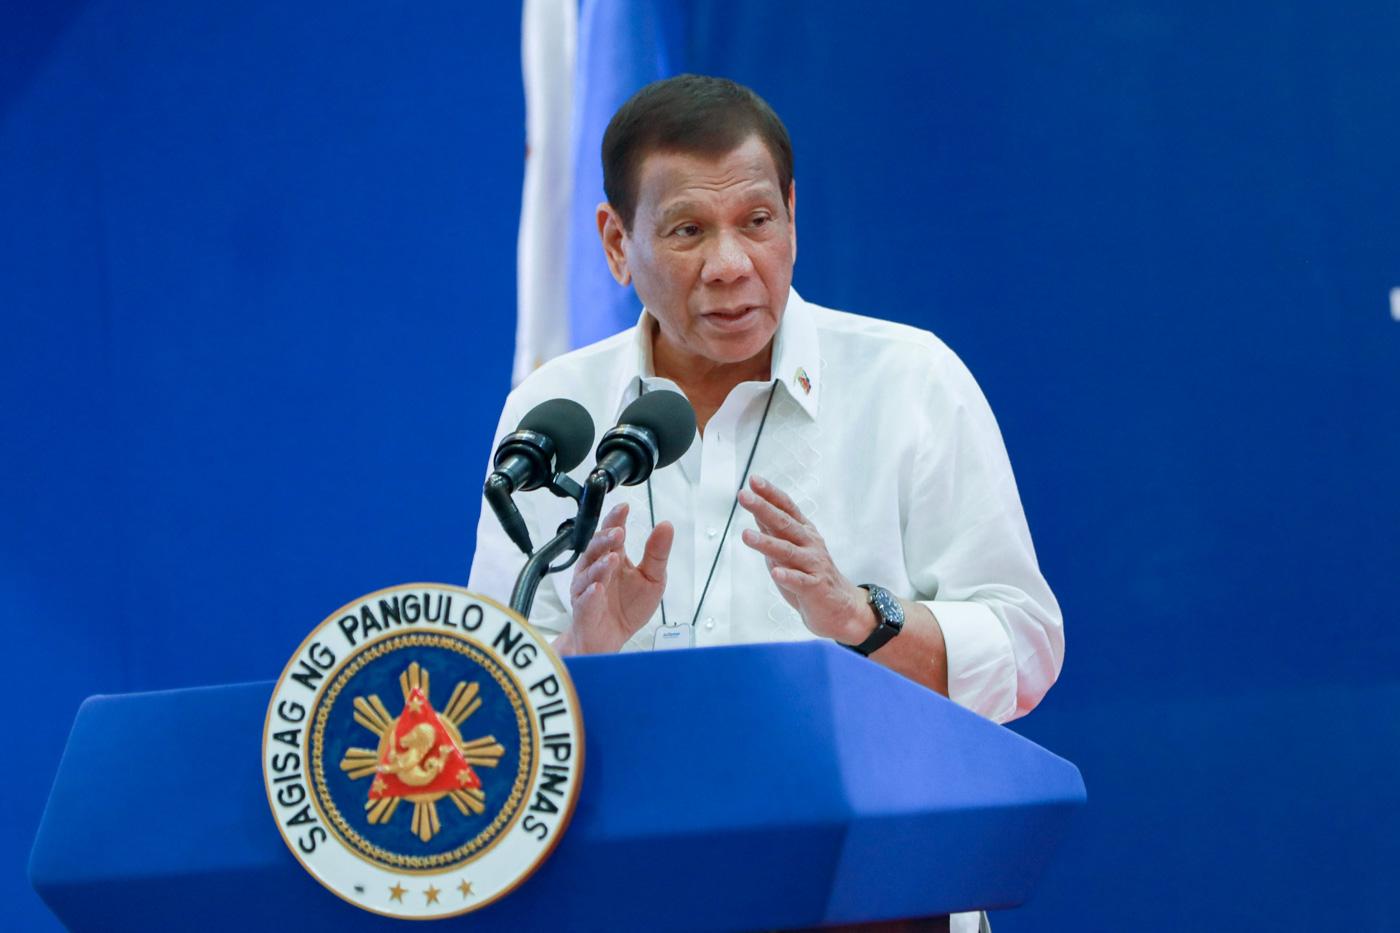 DUTERTE. President Rodrigo Duterte delivering a speech on January 29, 2020. Malacau00f1ang Photo